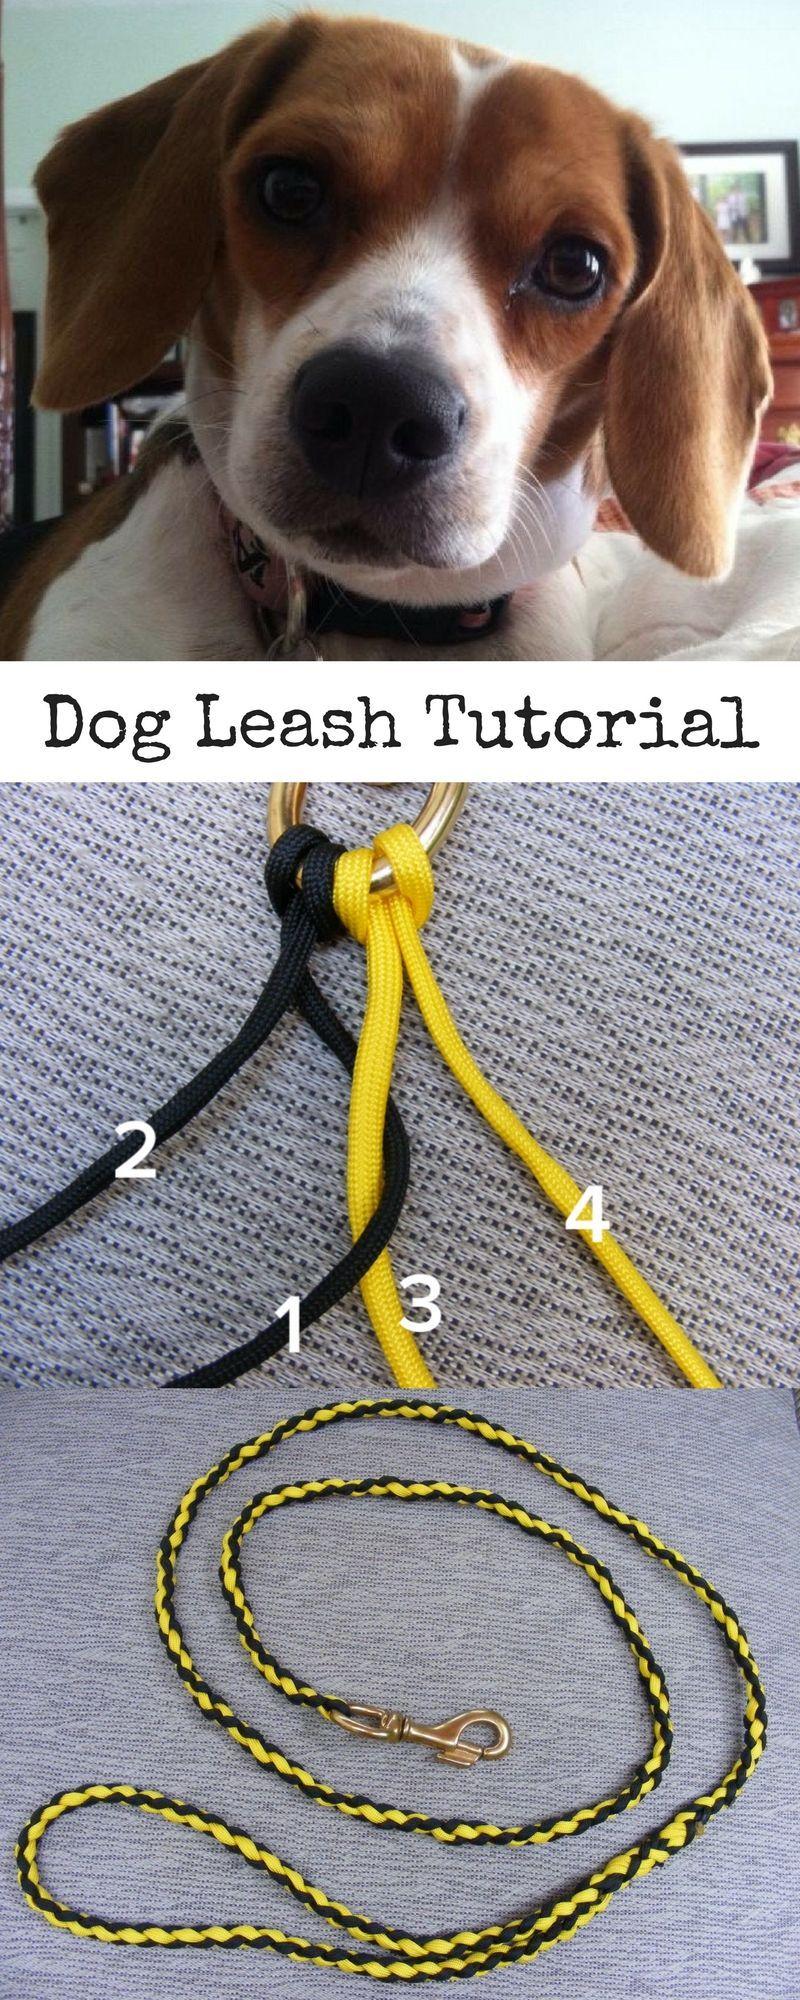 Make a paracord dog leash paracord dog leash dog leash